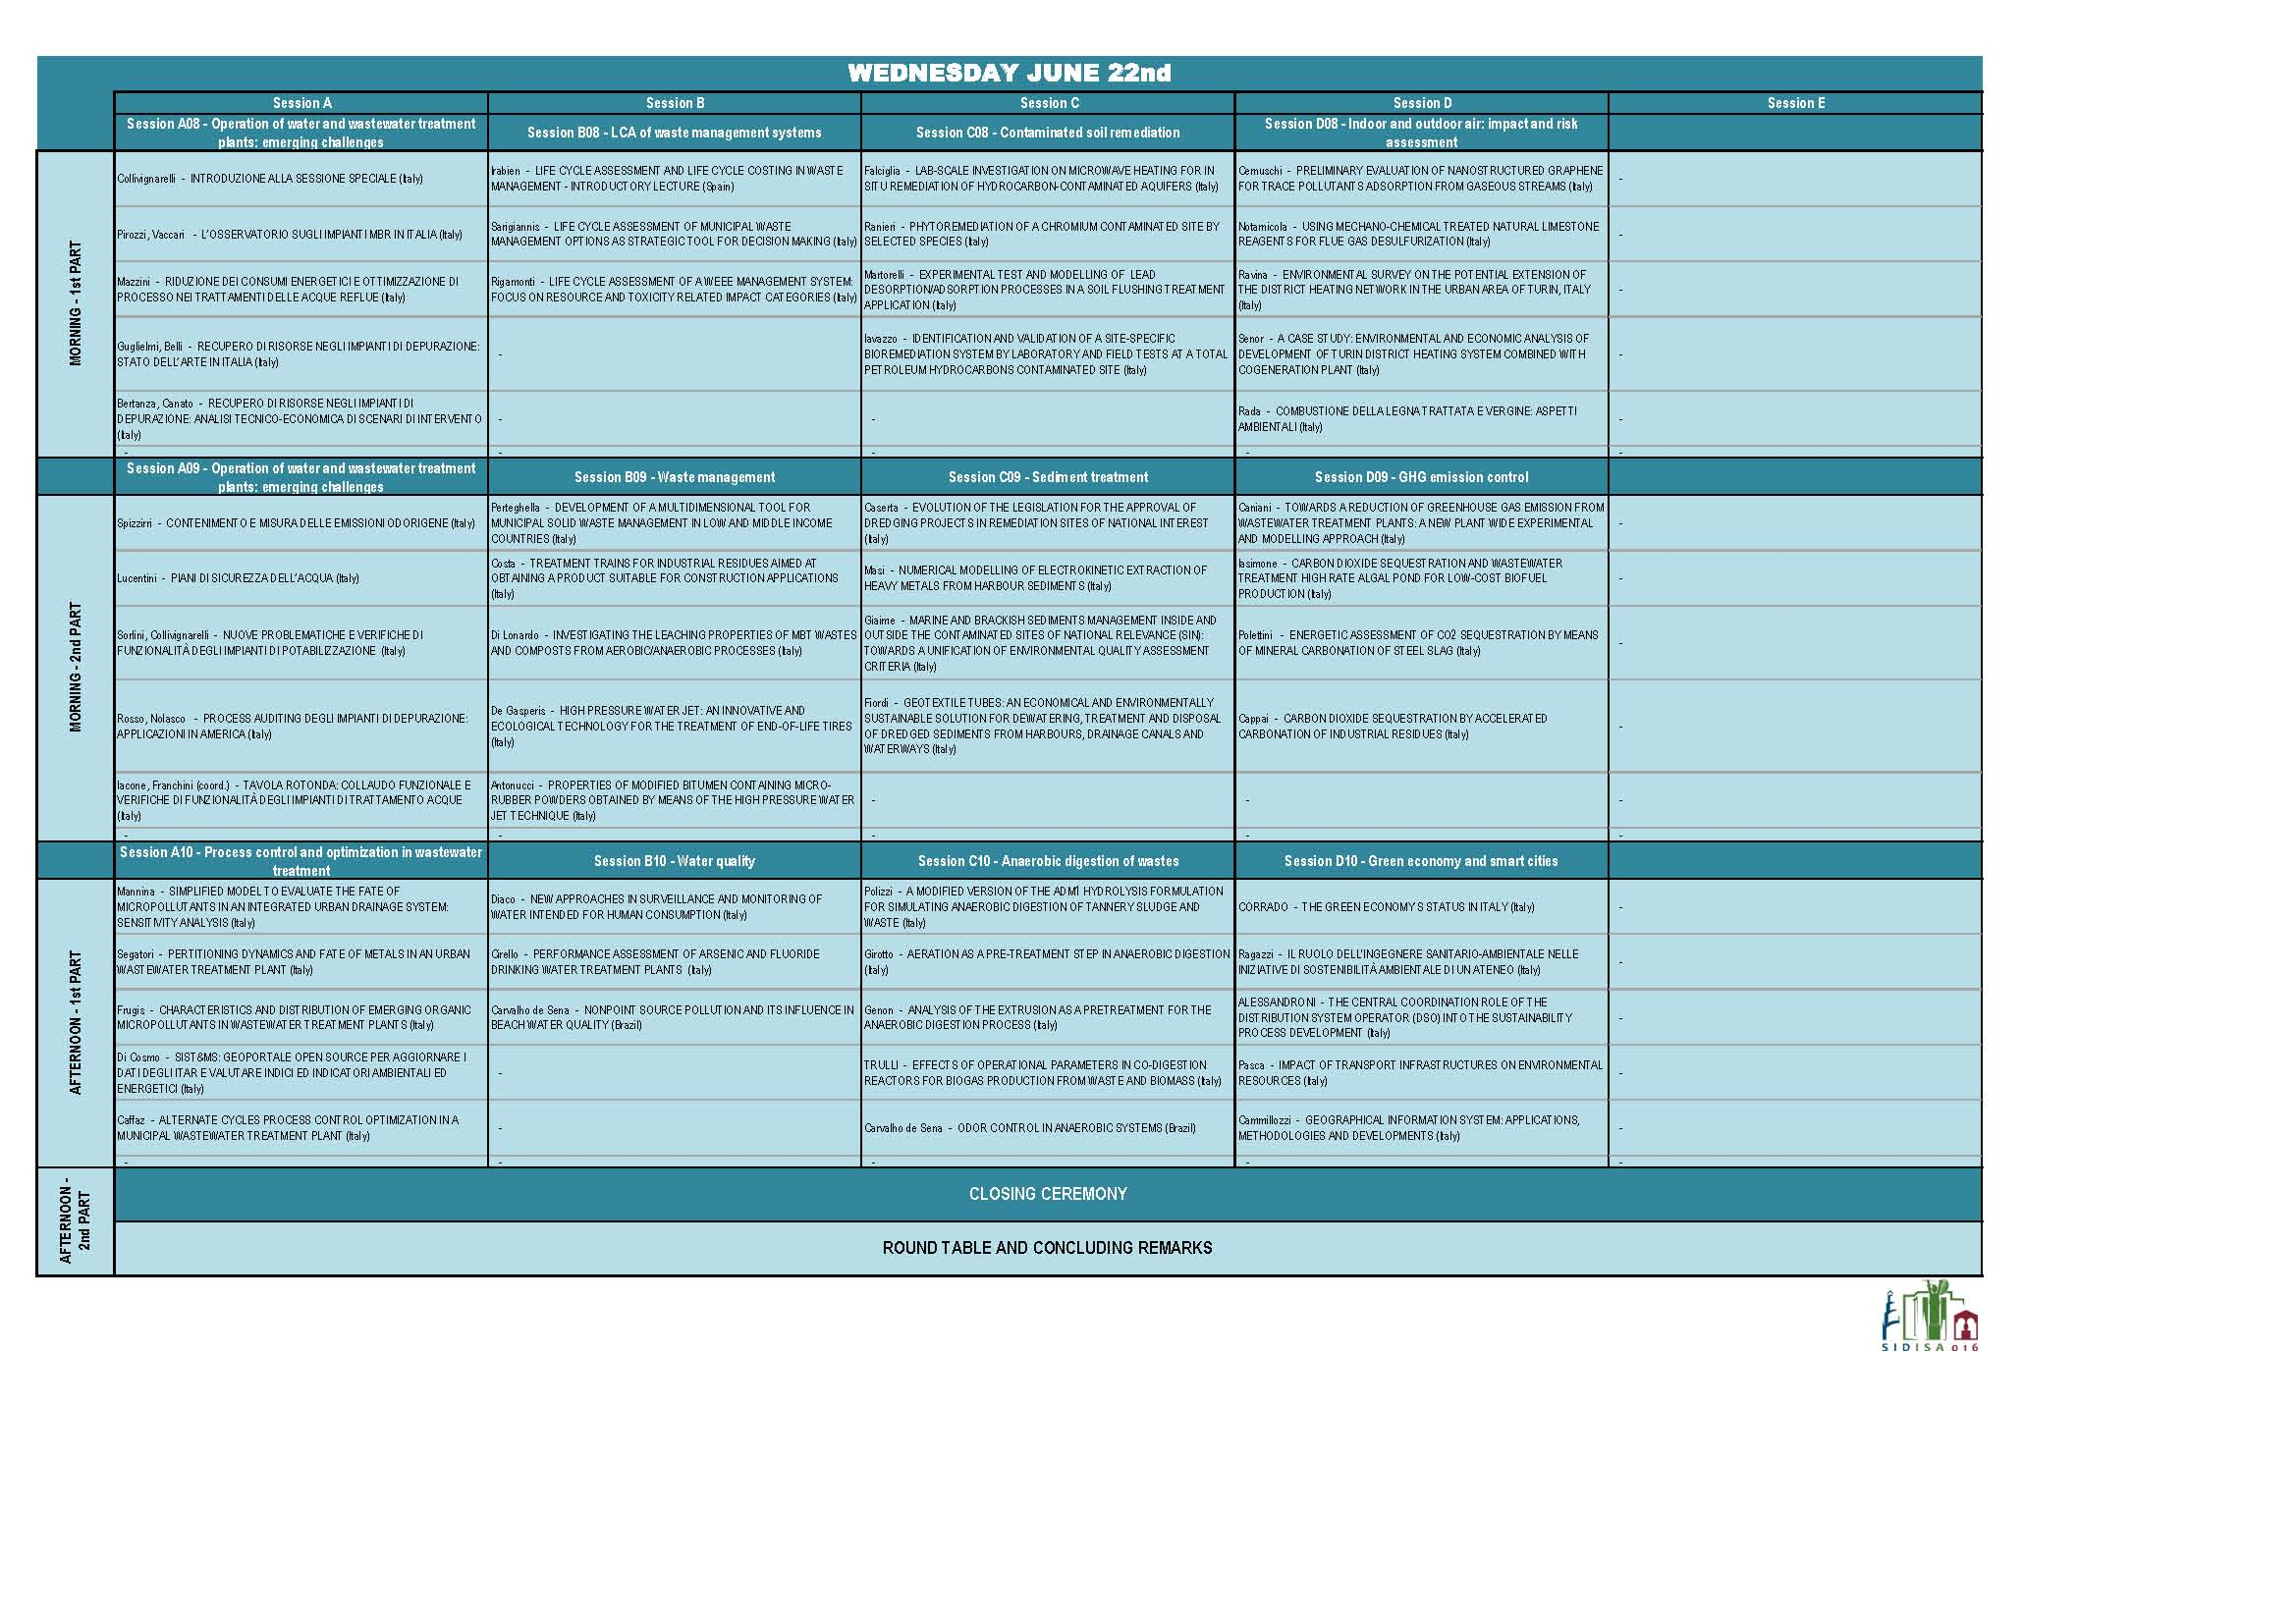 SIDISA16 tentative program 08-06-16_Page_3